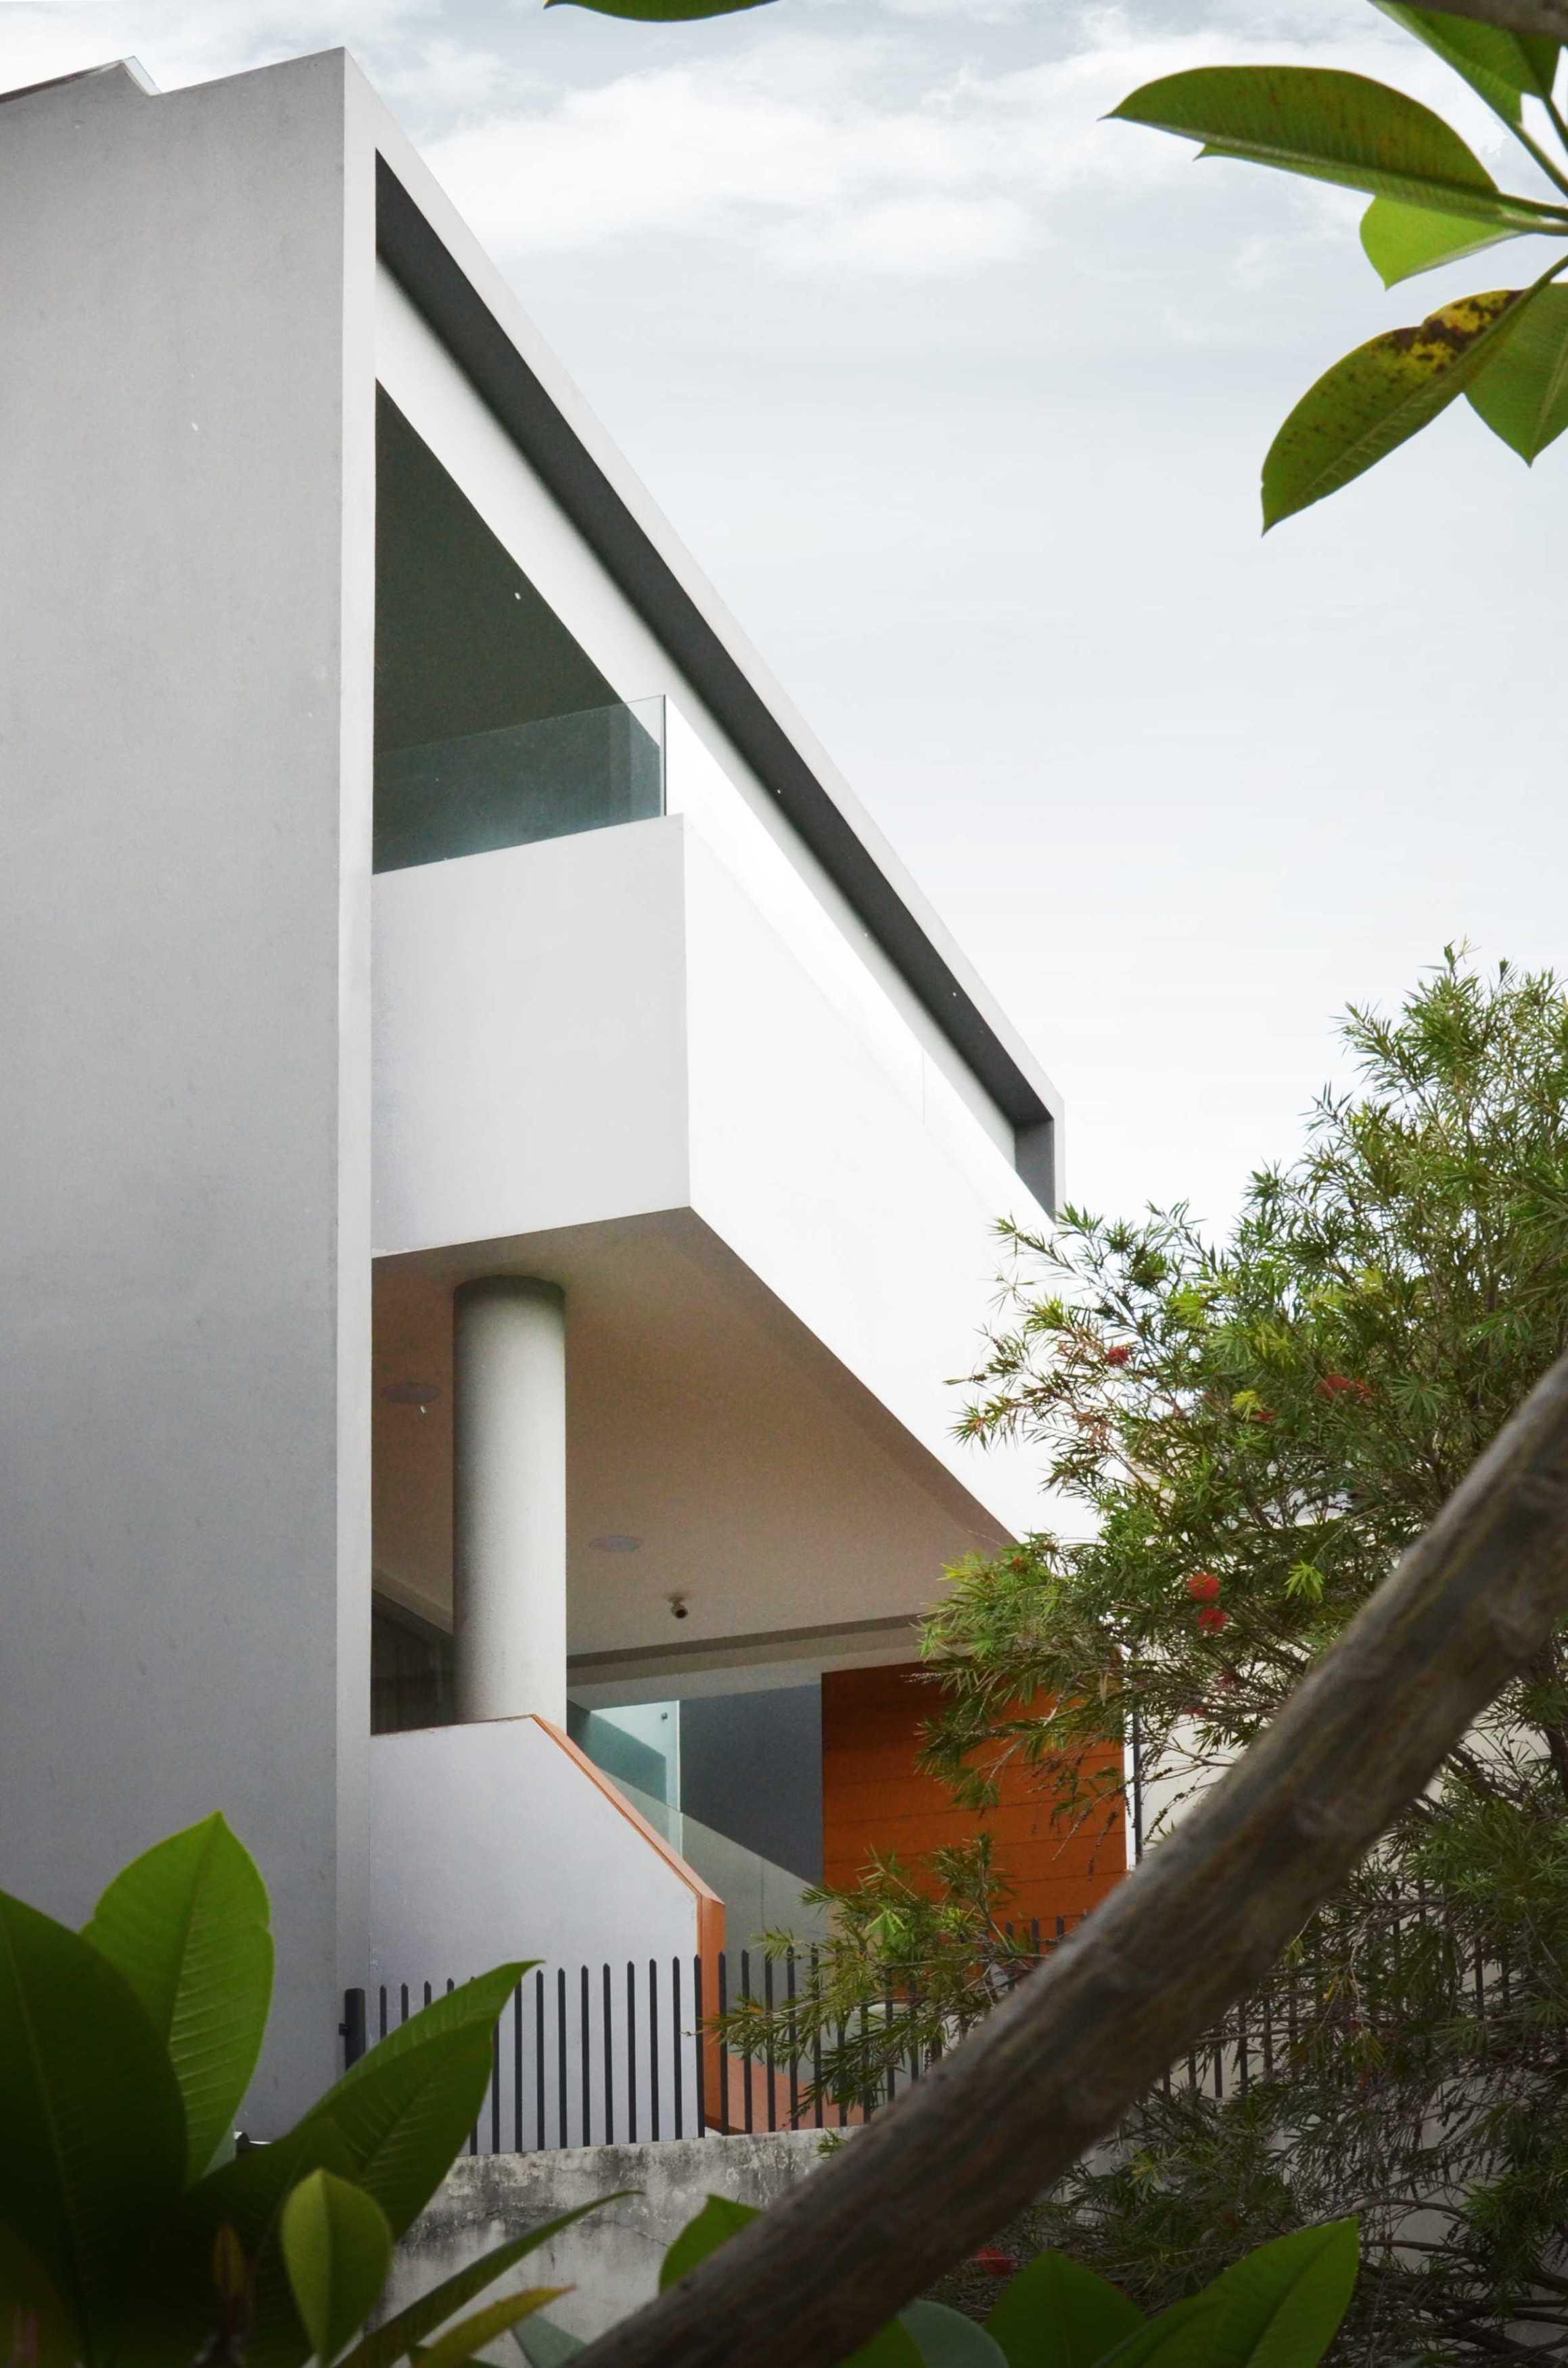 Oi Architect G House Tangerang, Kota Tangerang, Banten, Indonesia Tangerang, Kota Tangerang, Banten, Indonesia Oi-Architect-G-House   90268